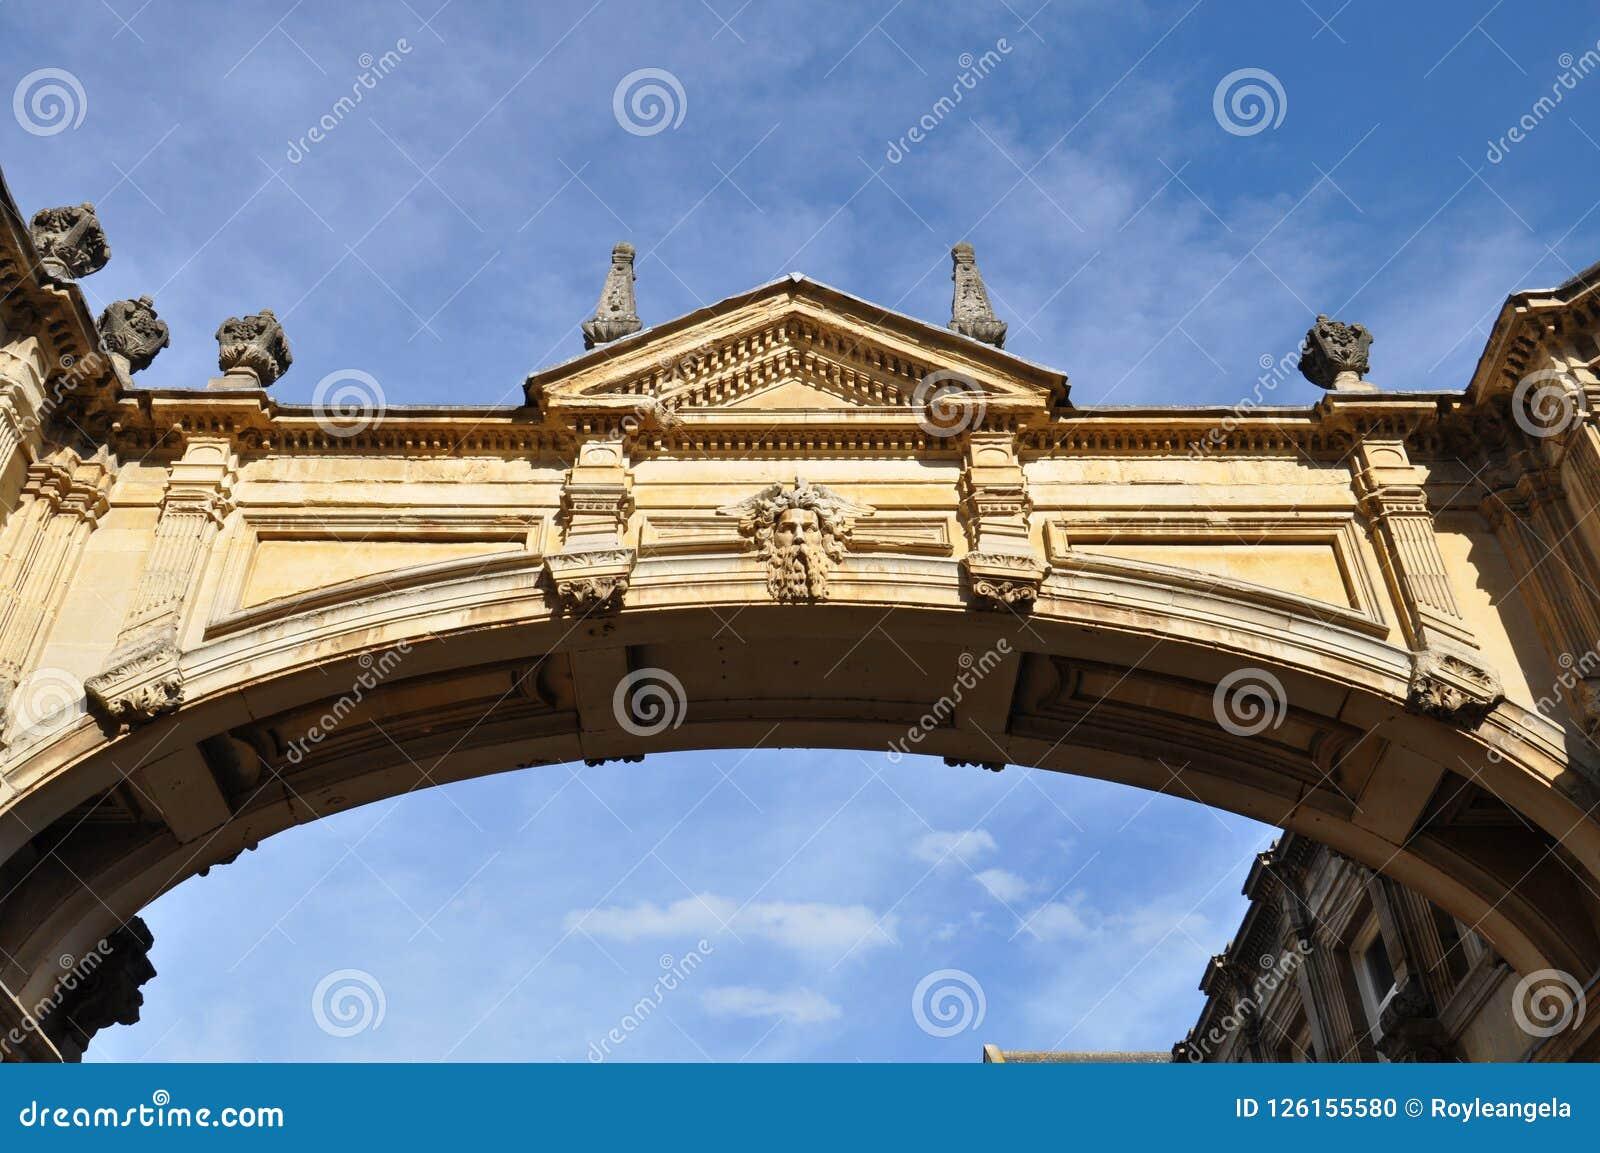 Ornate Bridge With Roman Reliefs Stock Photo Image Of